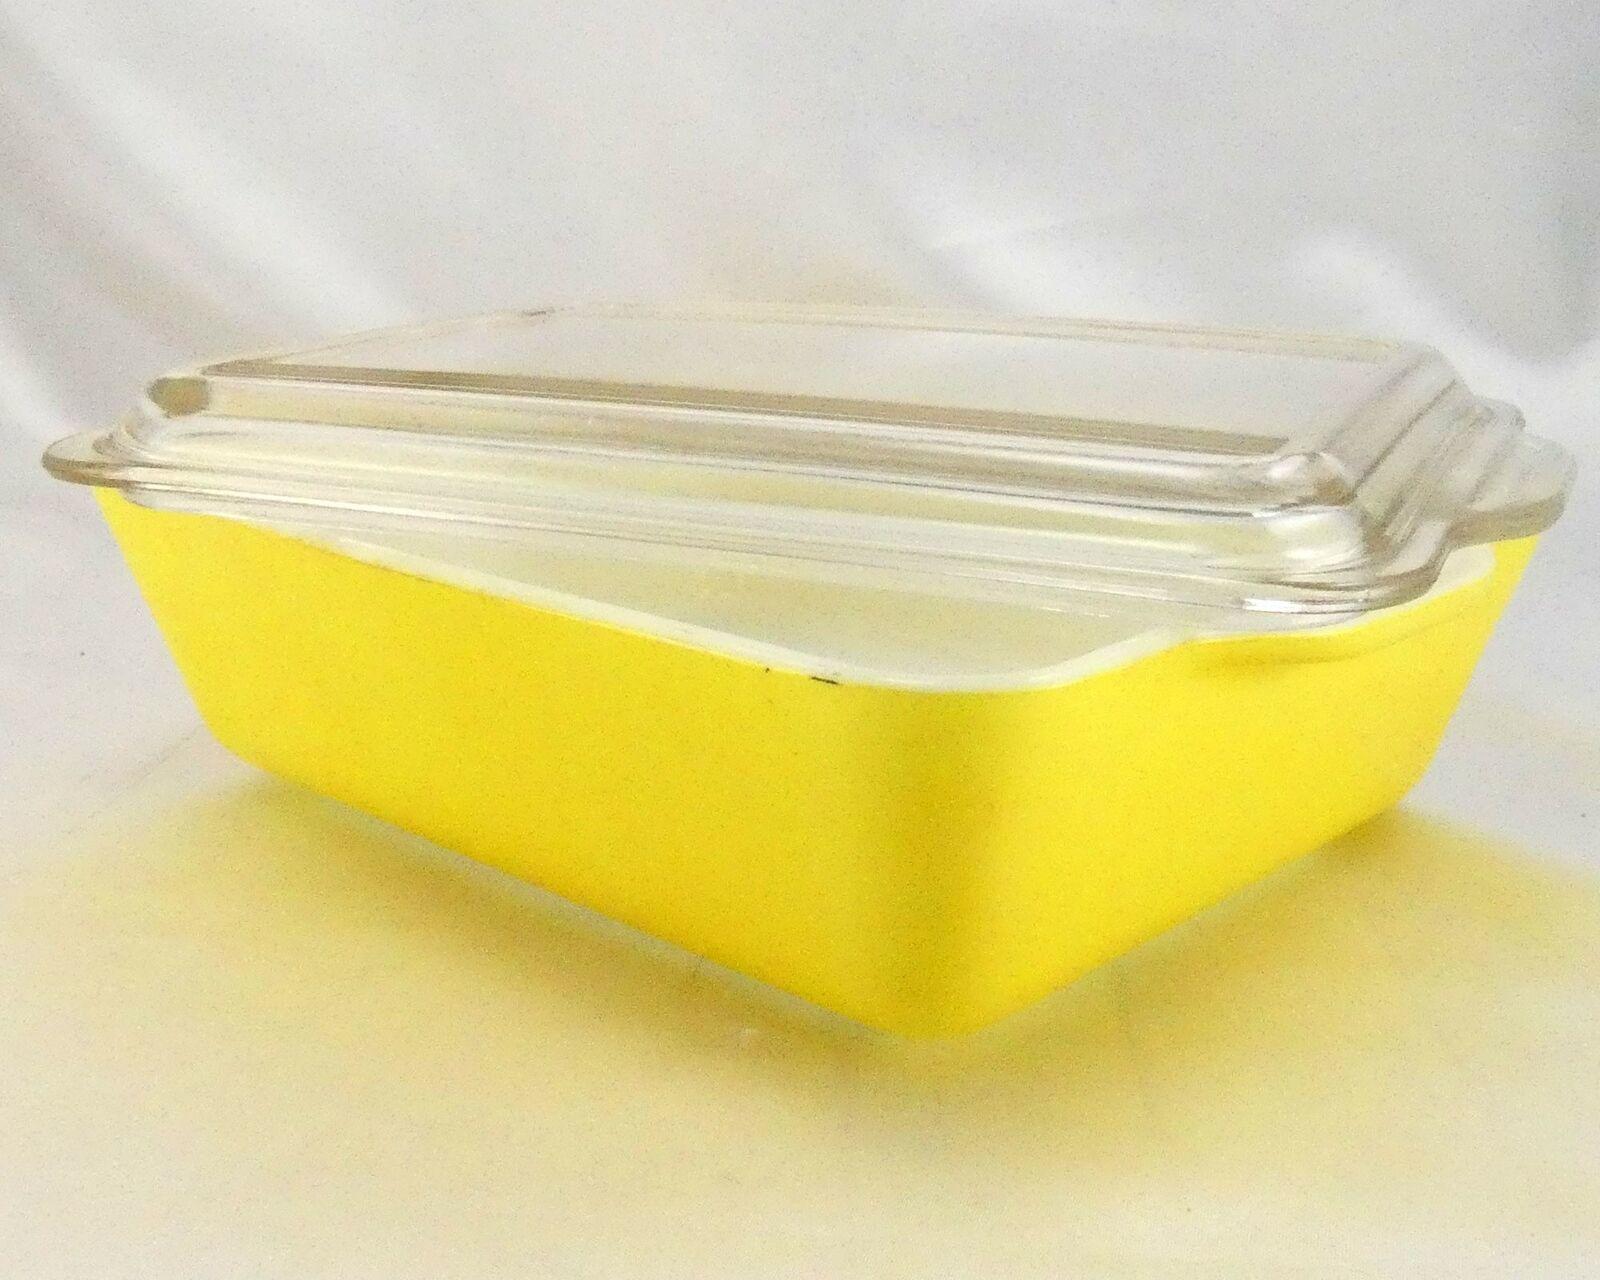 Pyrex 503 Banana Yellow Fridge Dish Milk Glass w/ Lid Made in the USA